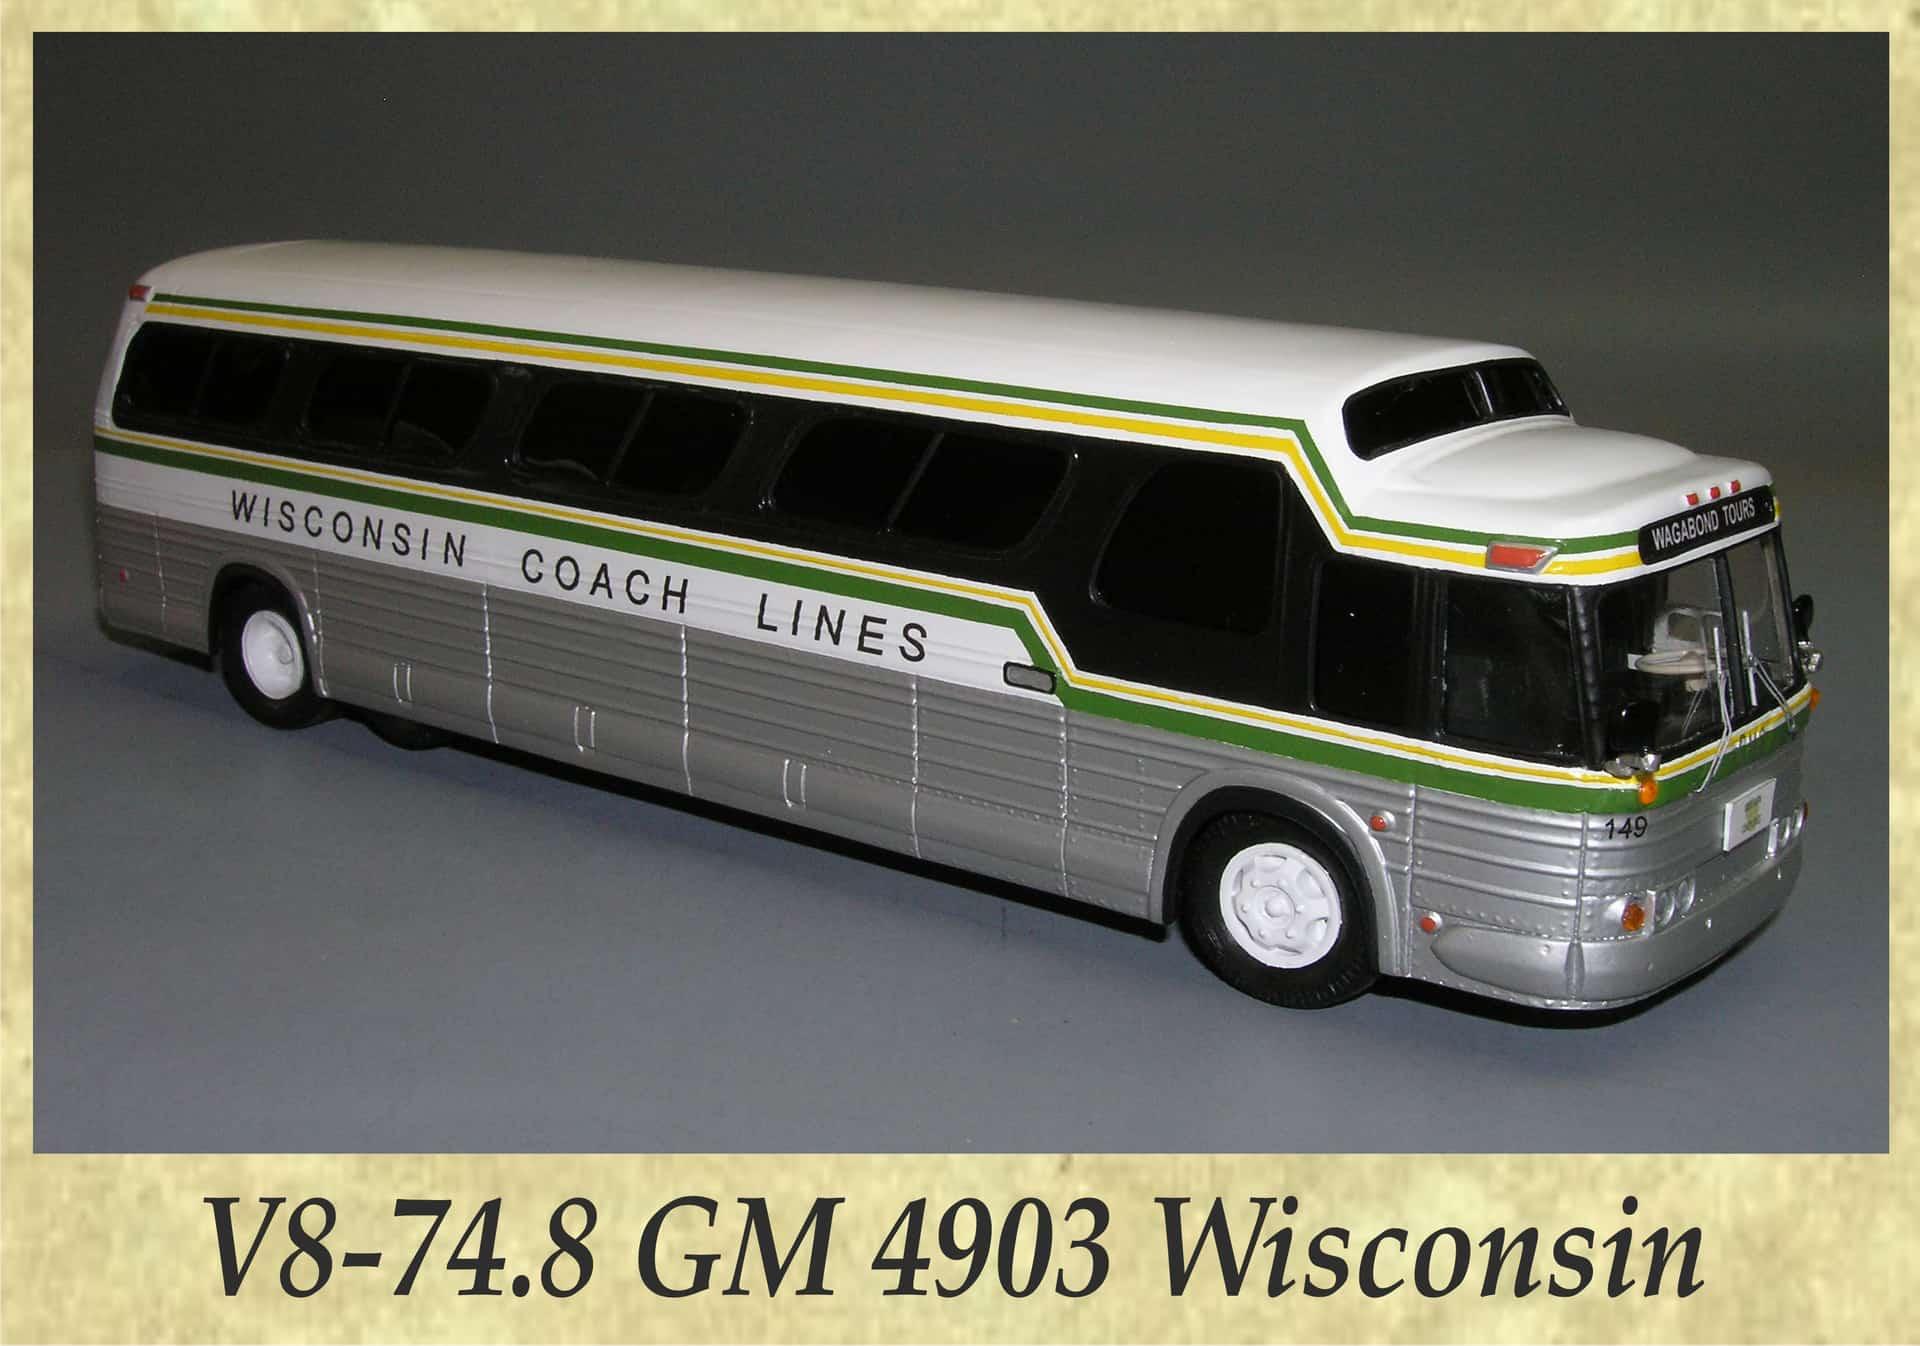 V8-74.8 GM 4903 Wisconsin